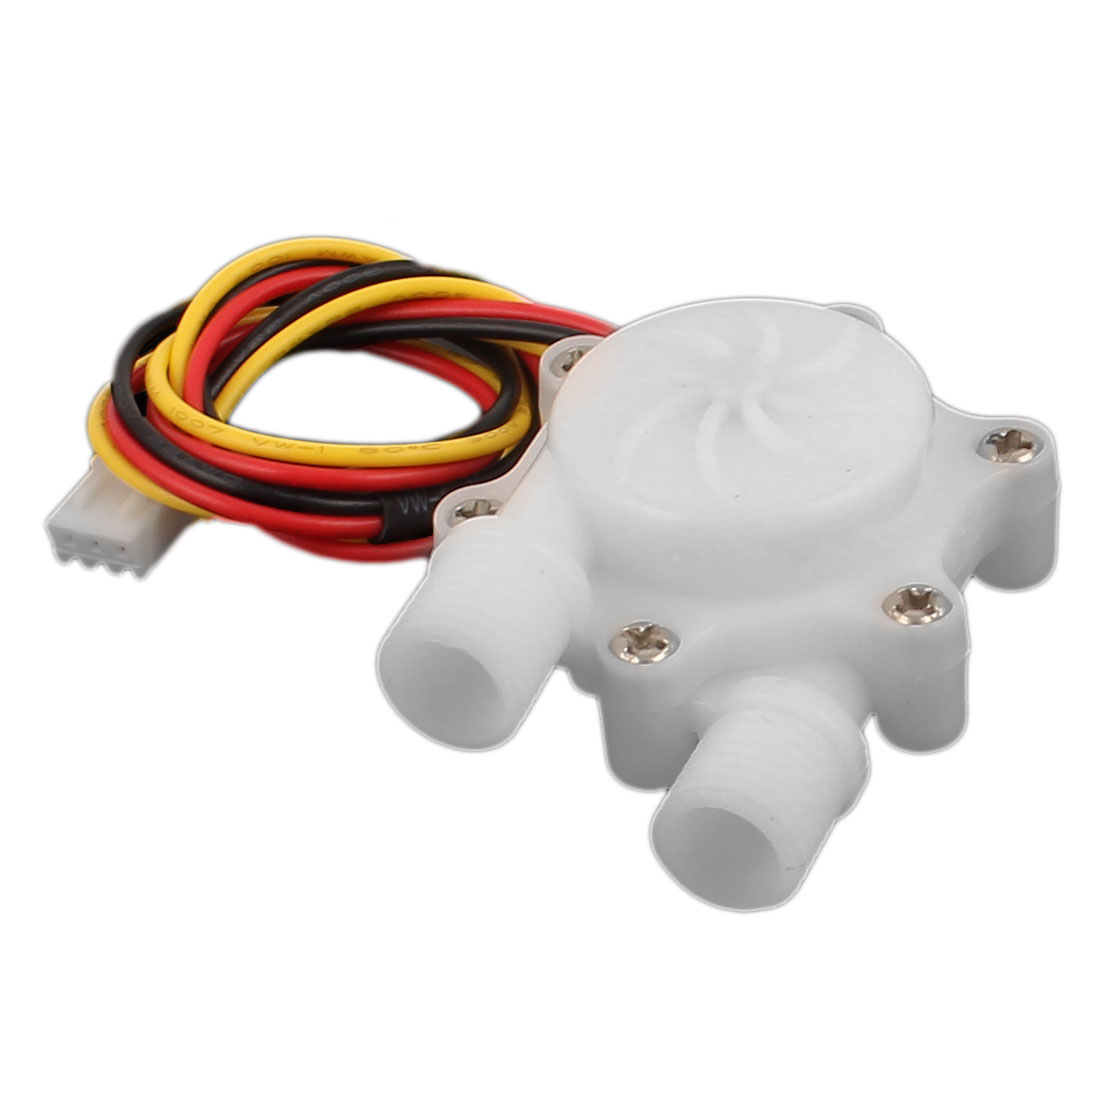 0.3-3.0L/min G1/4 Thread Inlet Outlet Water Flow Counter Sensor SEN-HW06W